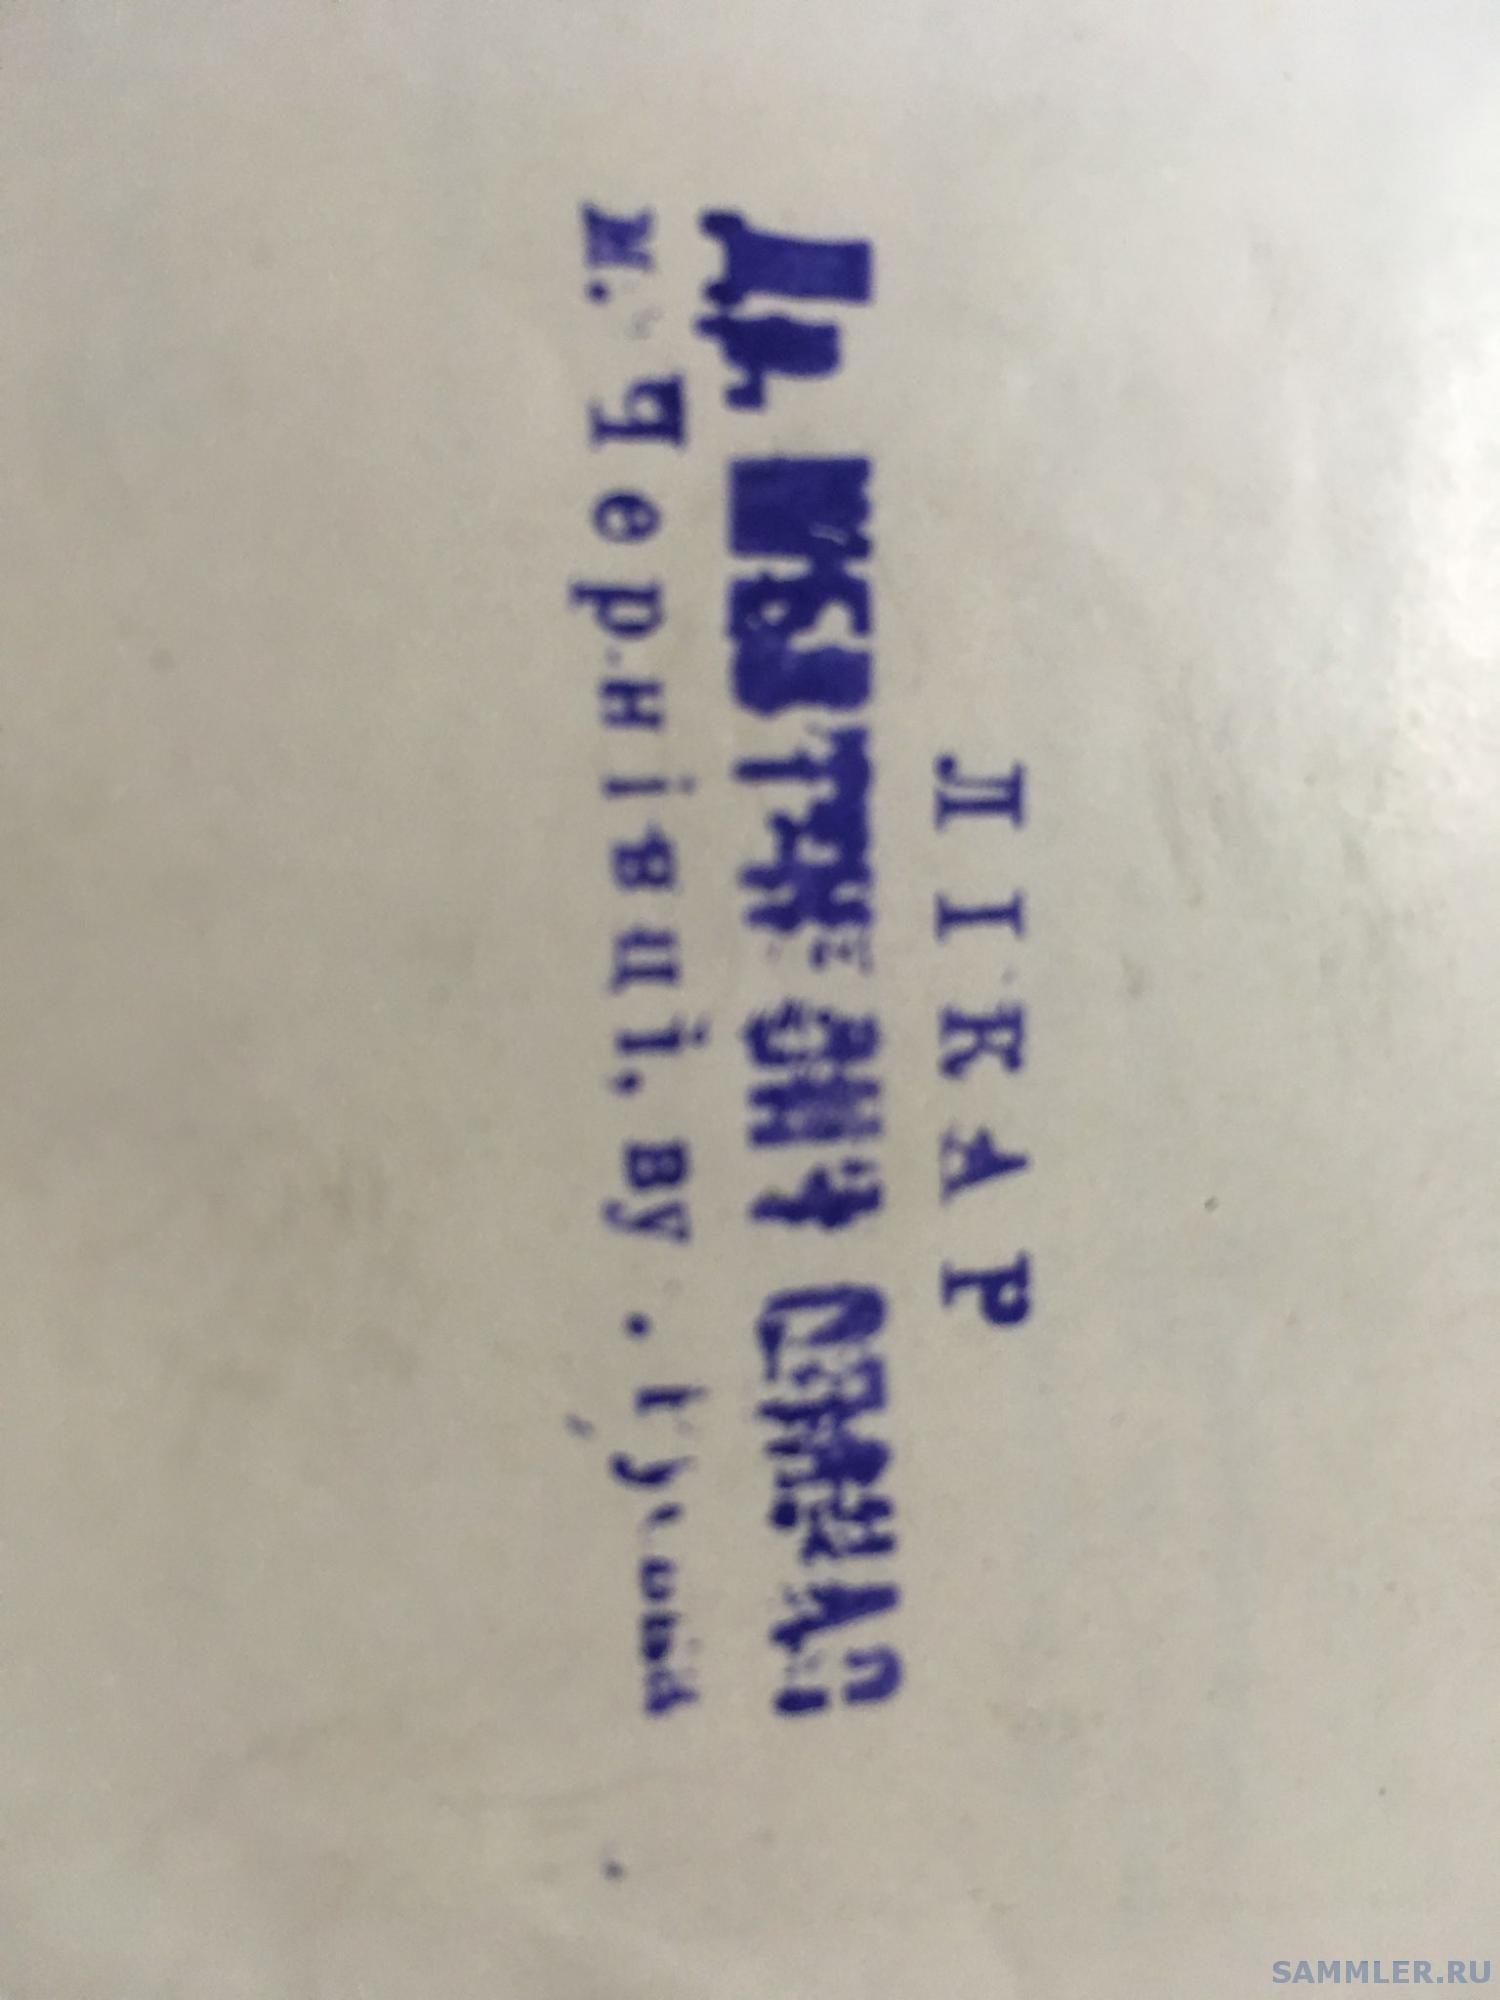 E4DD7737-9A13-4BDE-8C91-B49FD4AB46F9.jpg